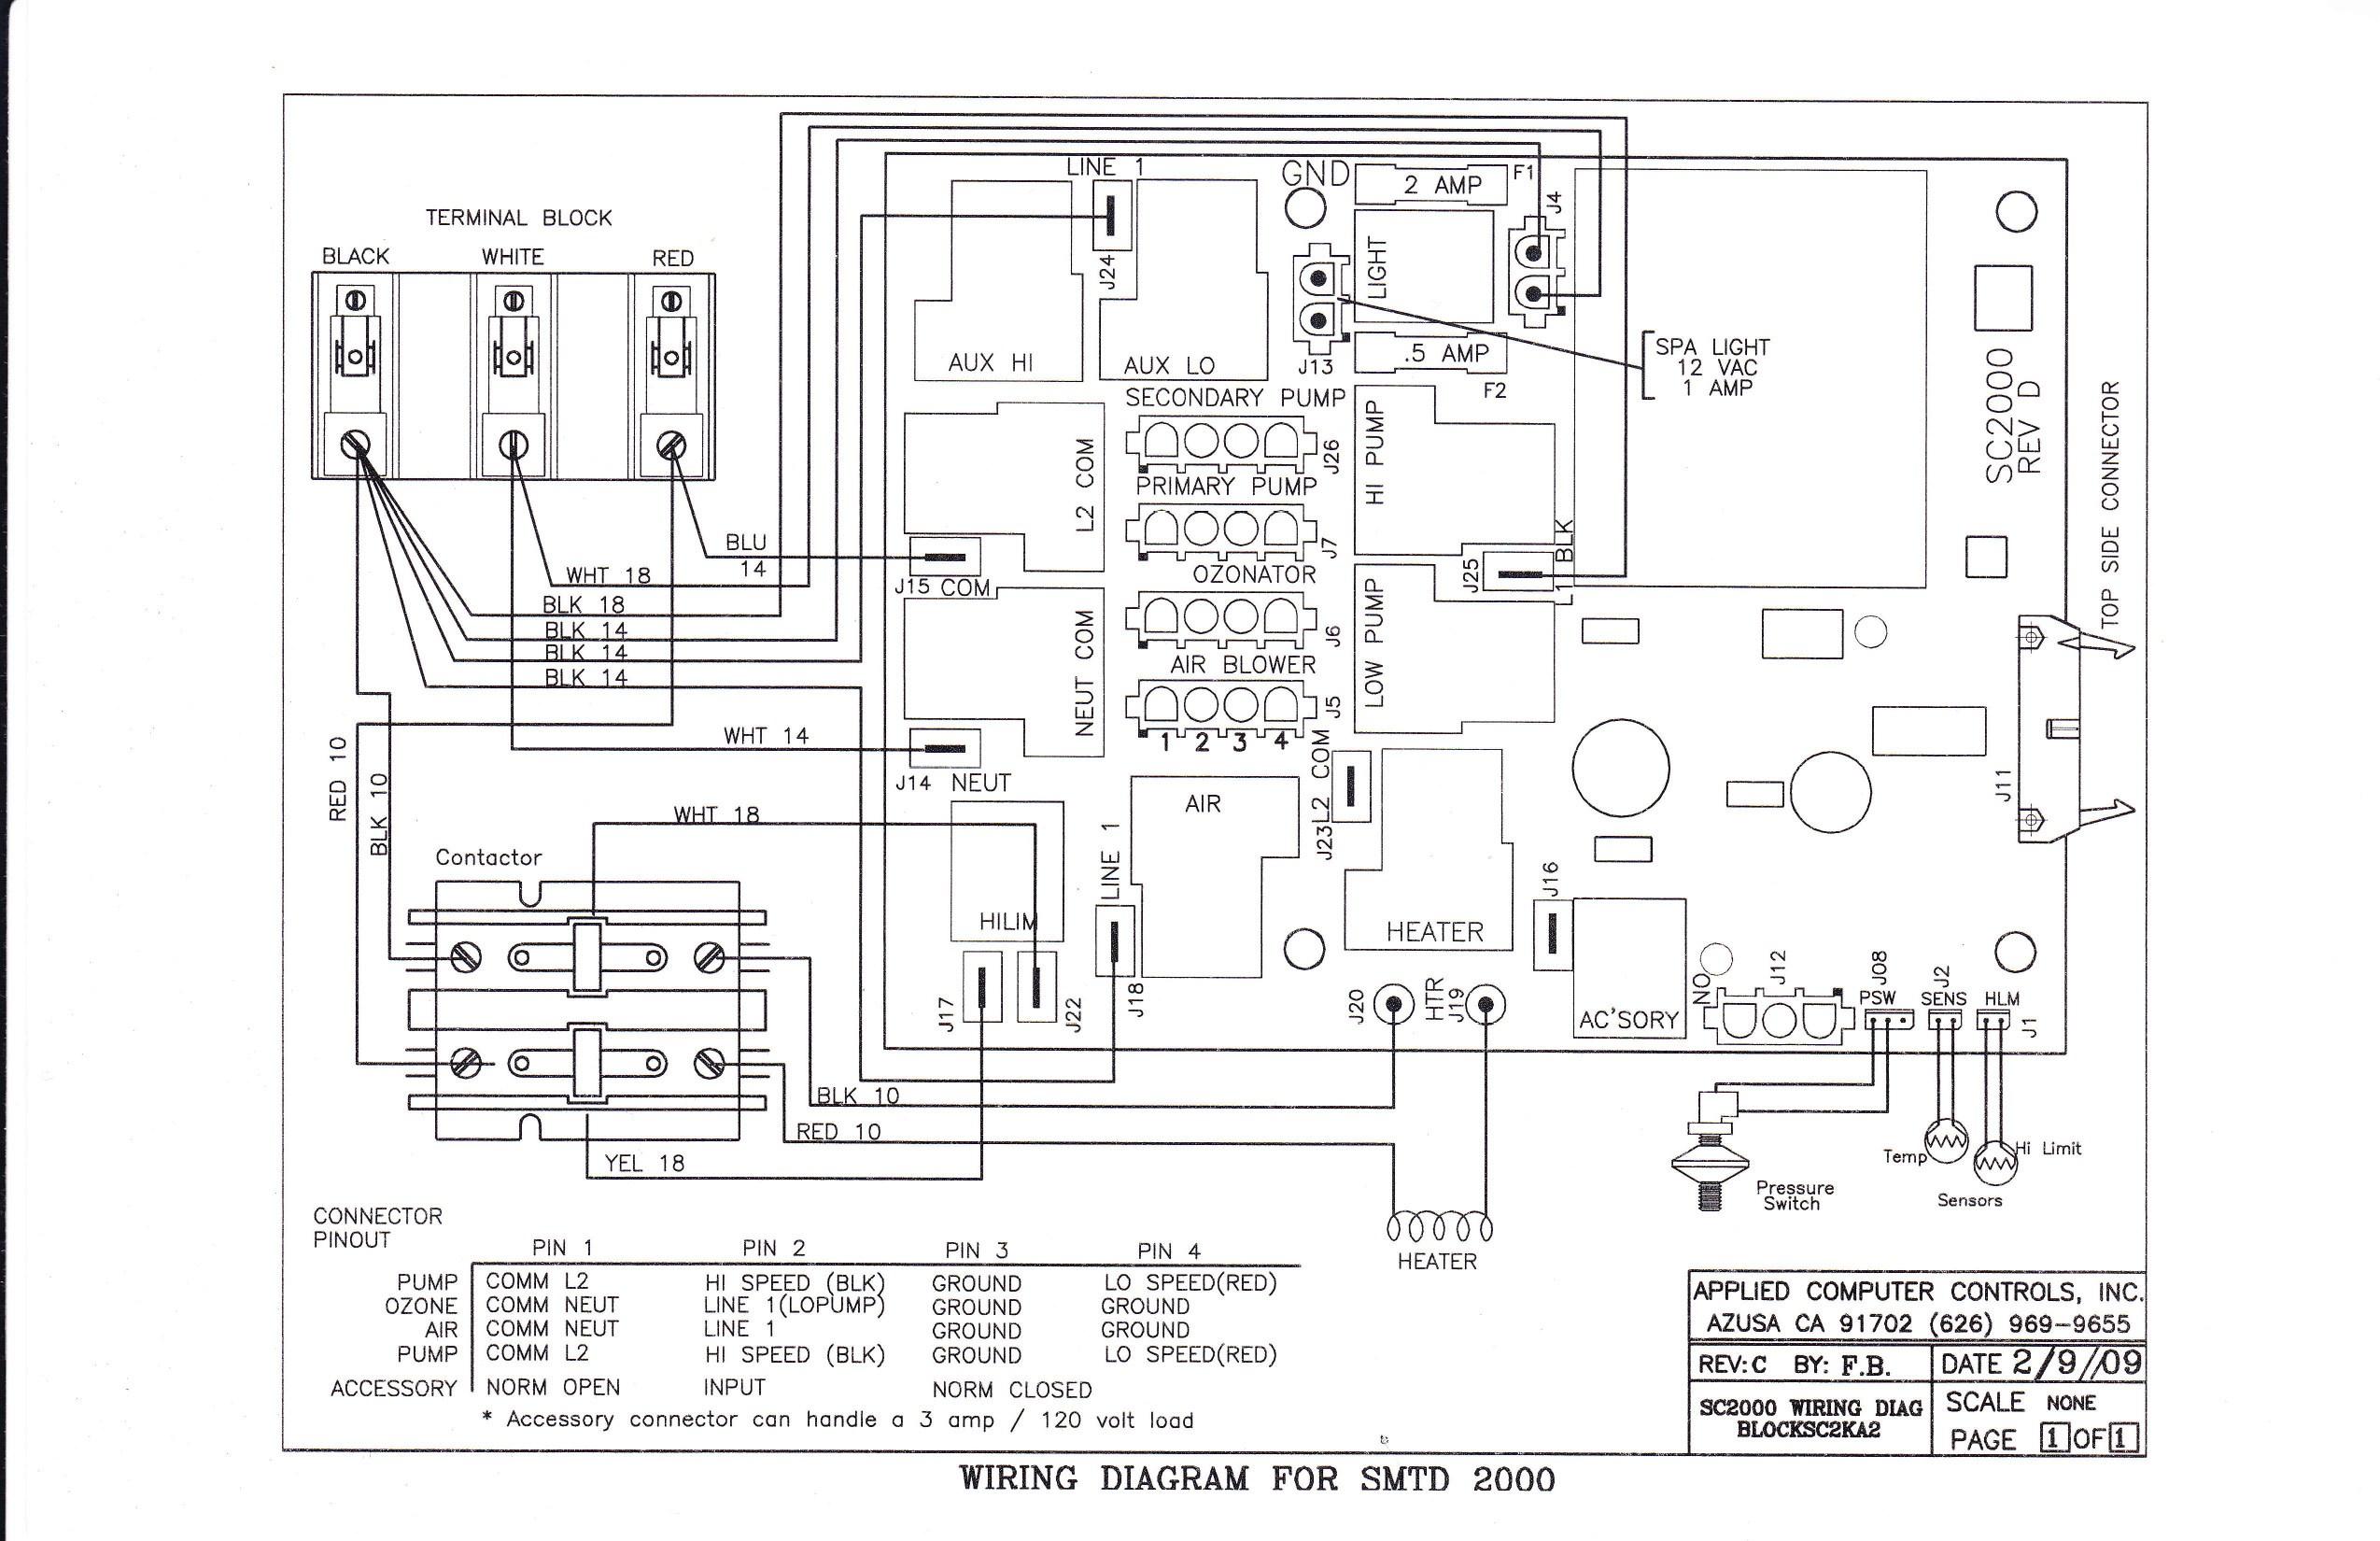 Startrans Bus Wiring Diagrams 2007 Vw New Beetle Fuse Diagram Free Download Juniorsmdlamarina Es